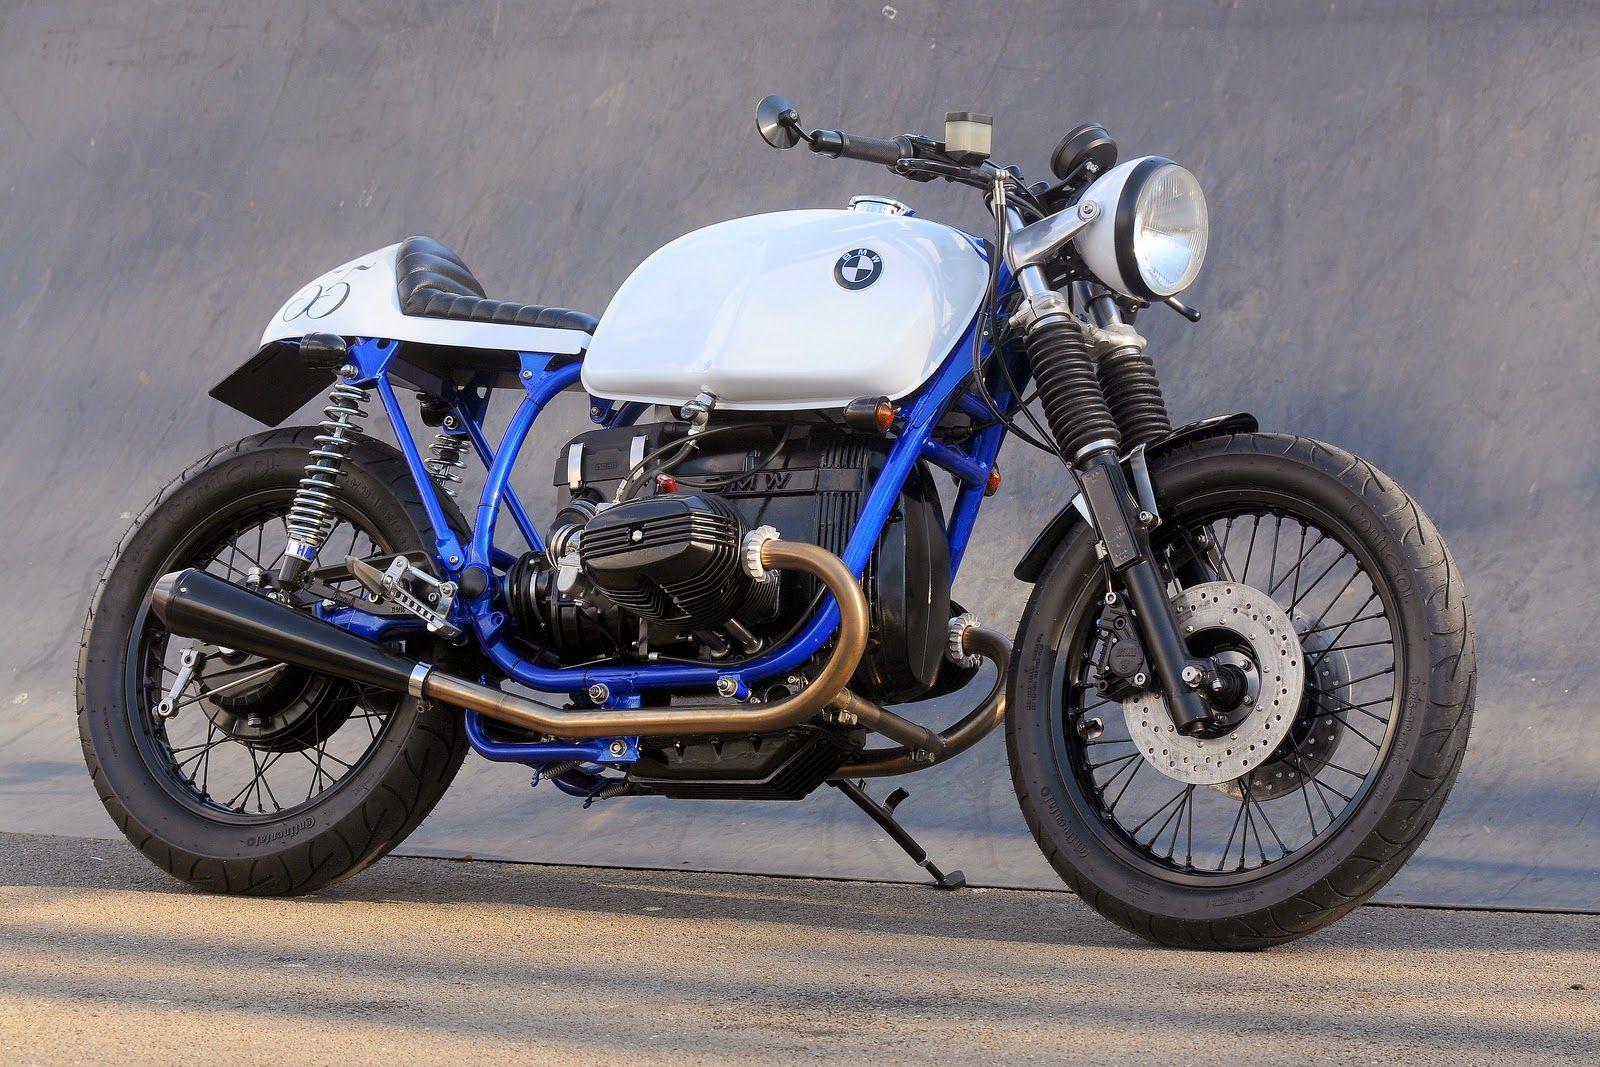 Pin di Stefano Zambianchi su BMW Cafe Racer project